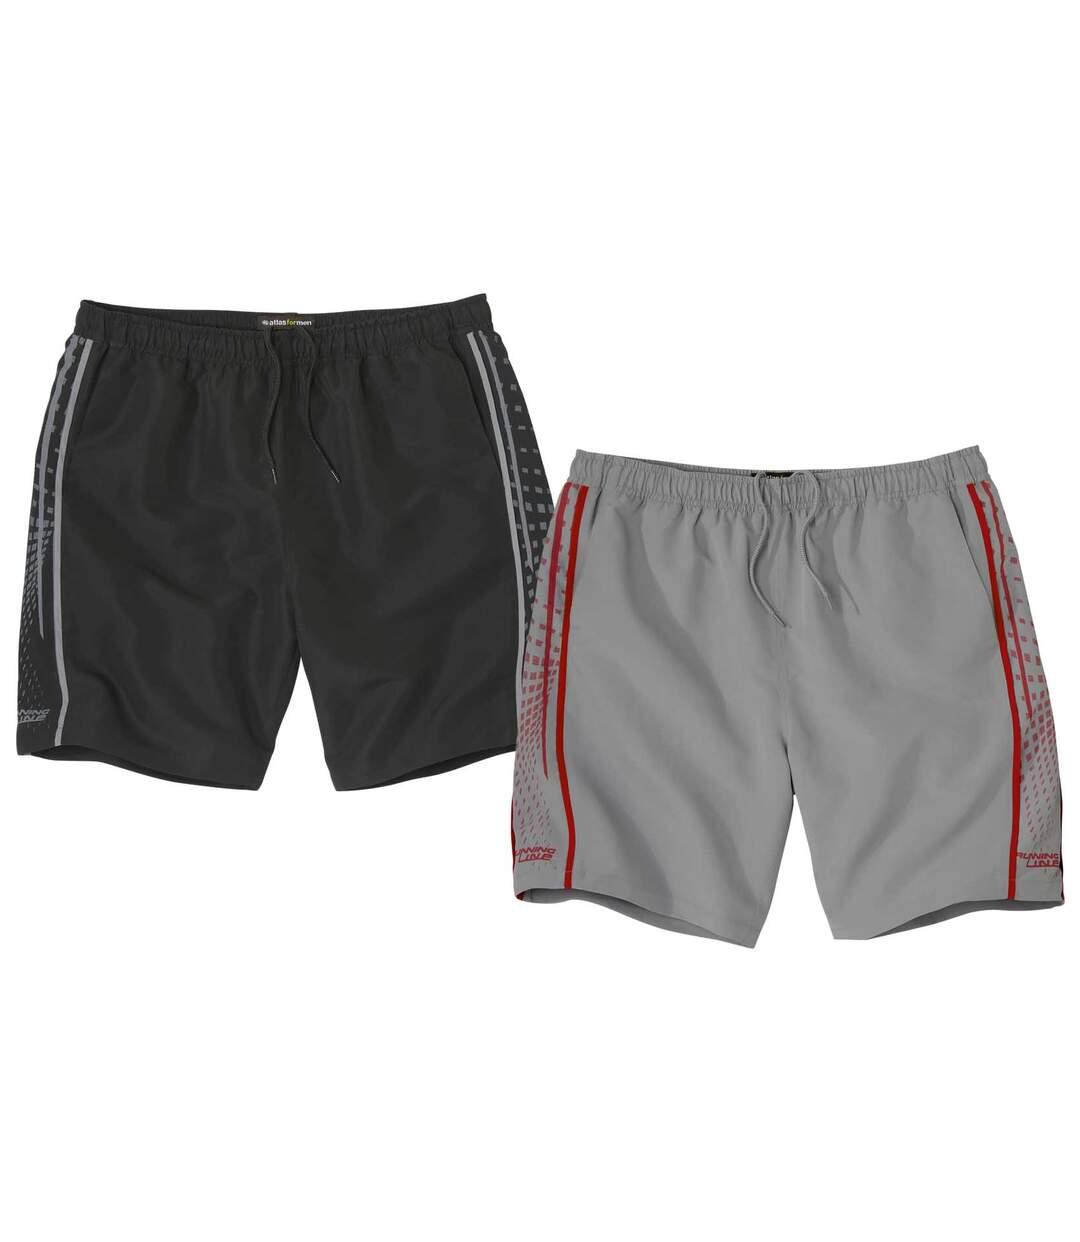 Sada 2 sportovních šortek z mikrovlákna Atlas For Men